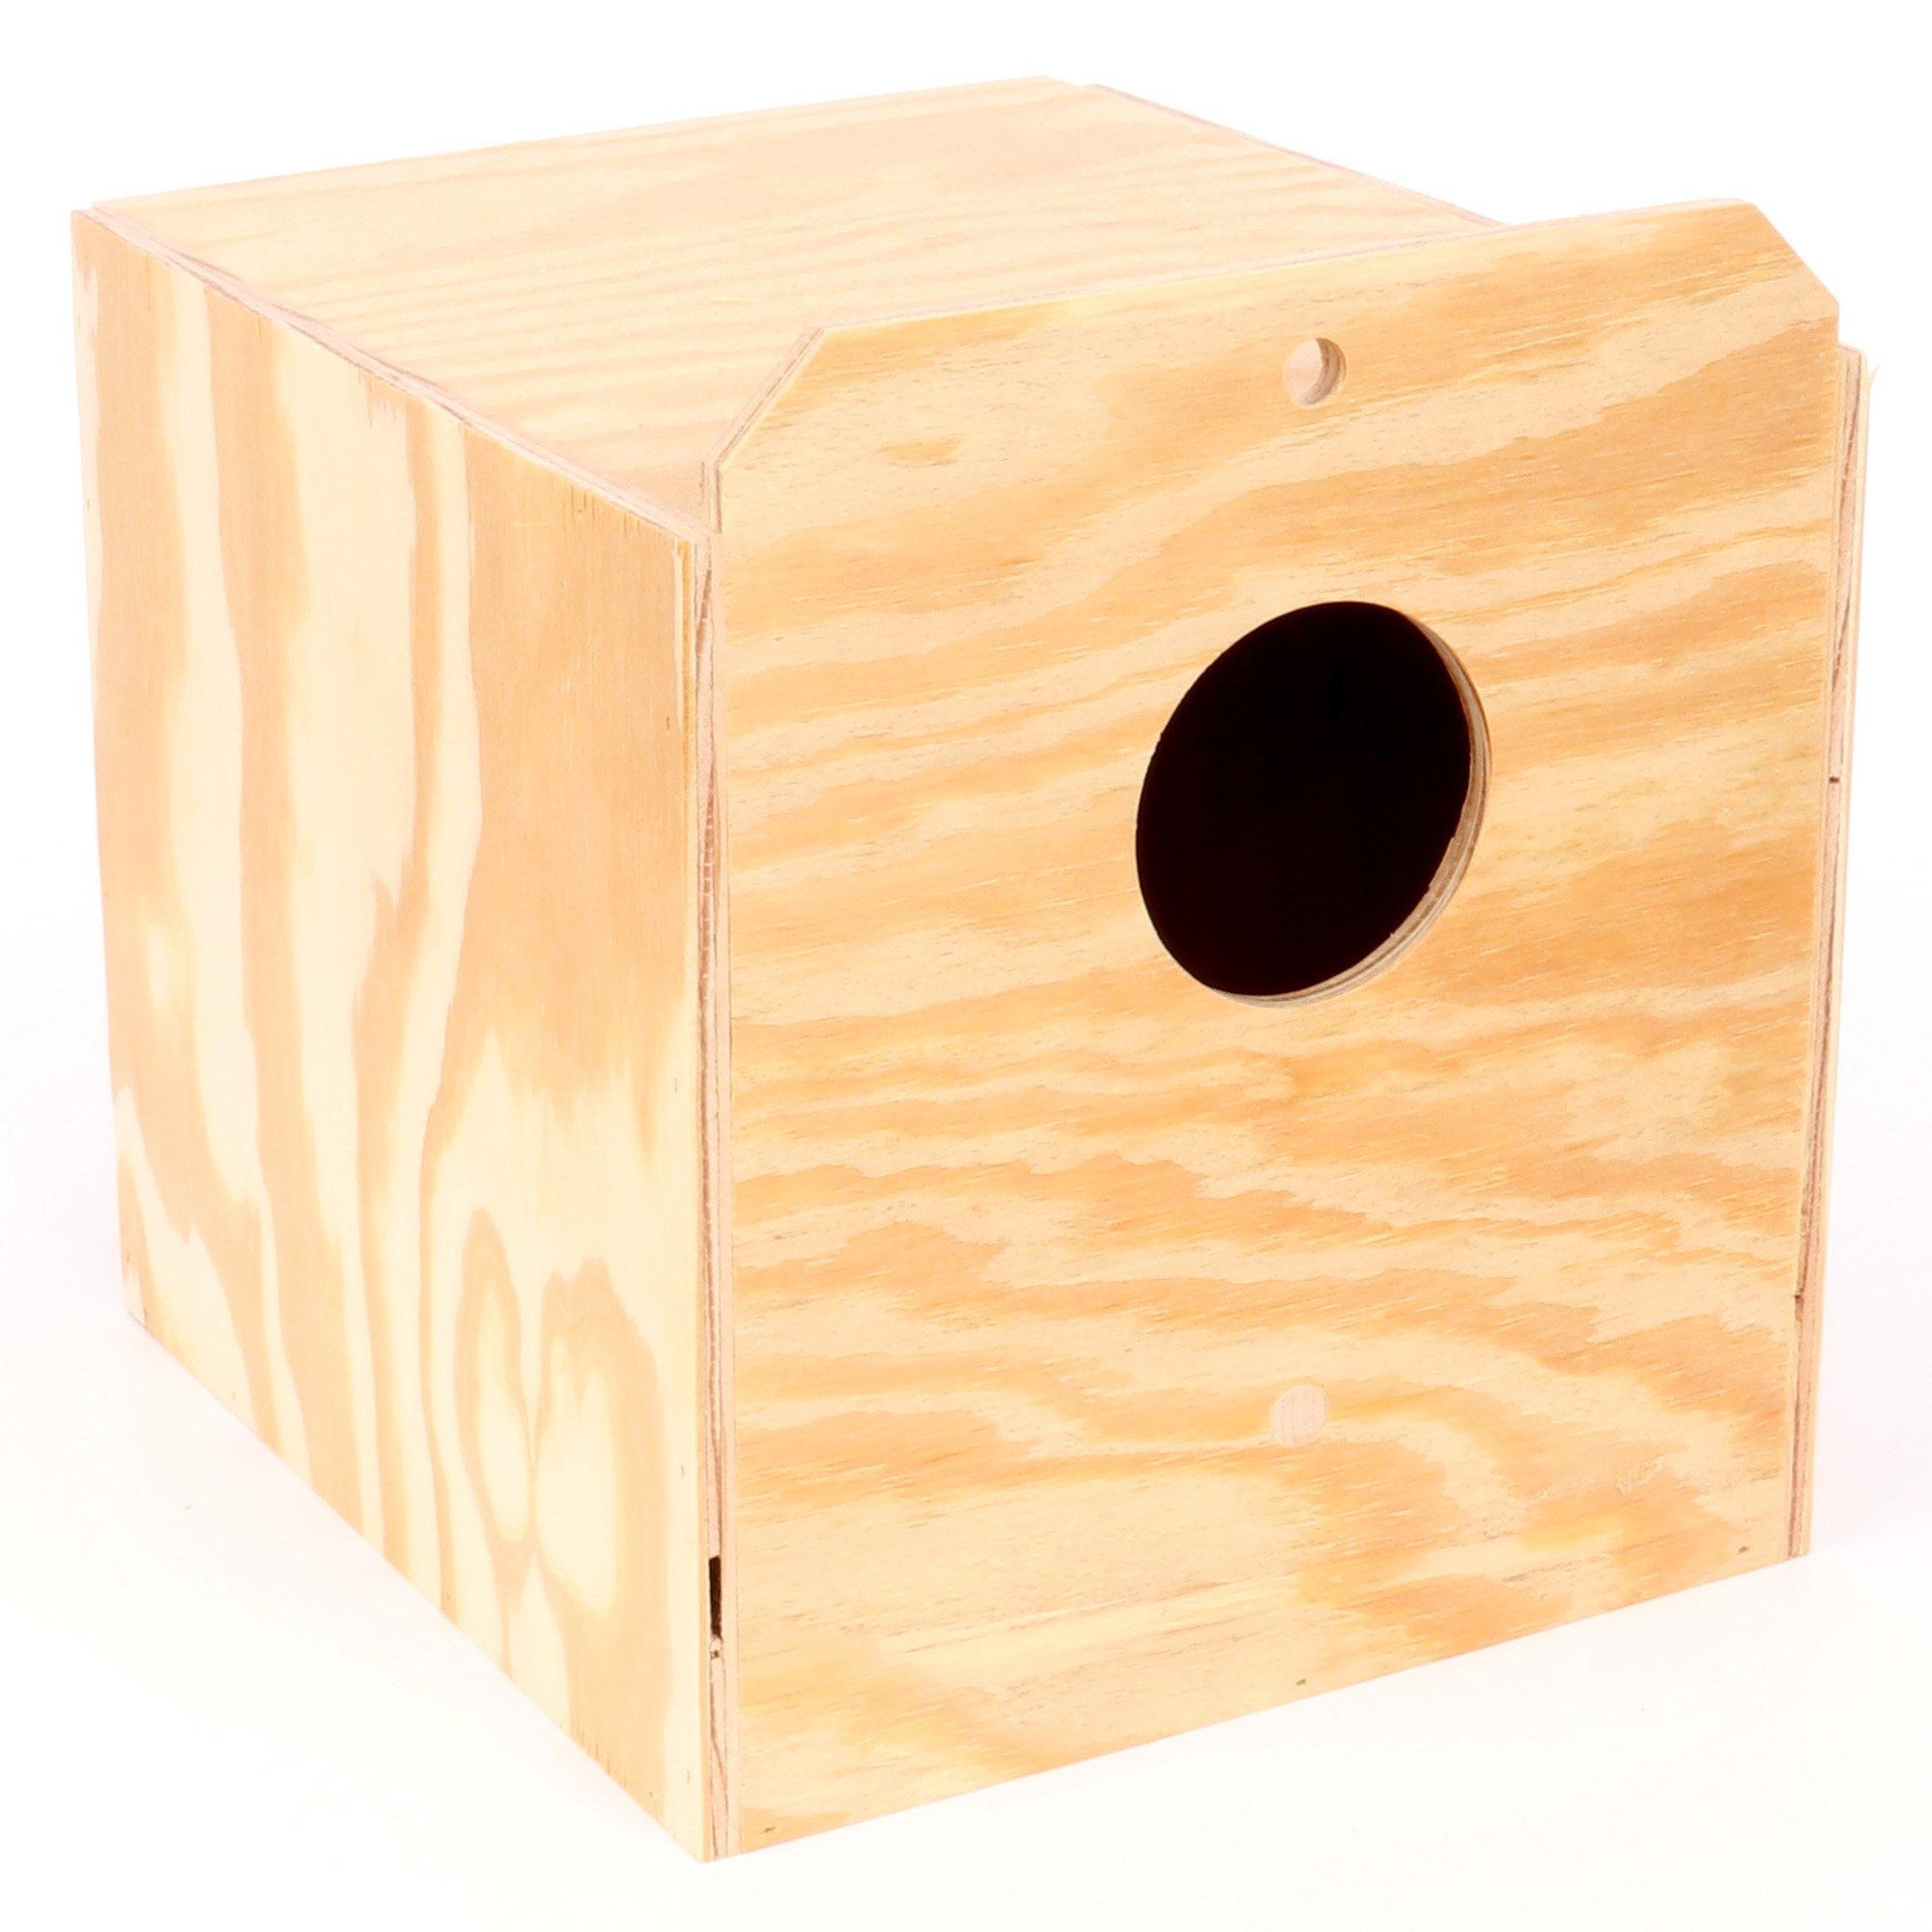 Ware Manufacturing Wood Cockatiel Reverse Nest Box, Tiel by Ware Manufacturing